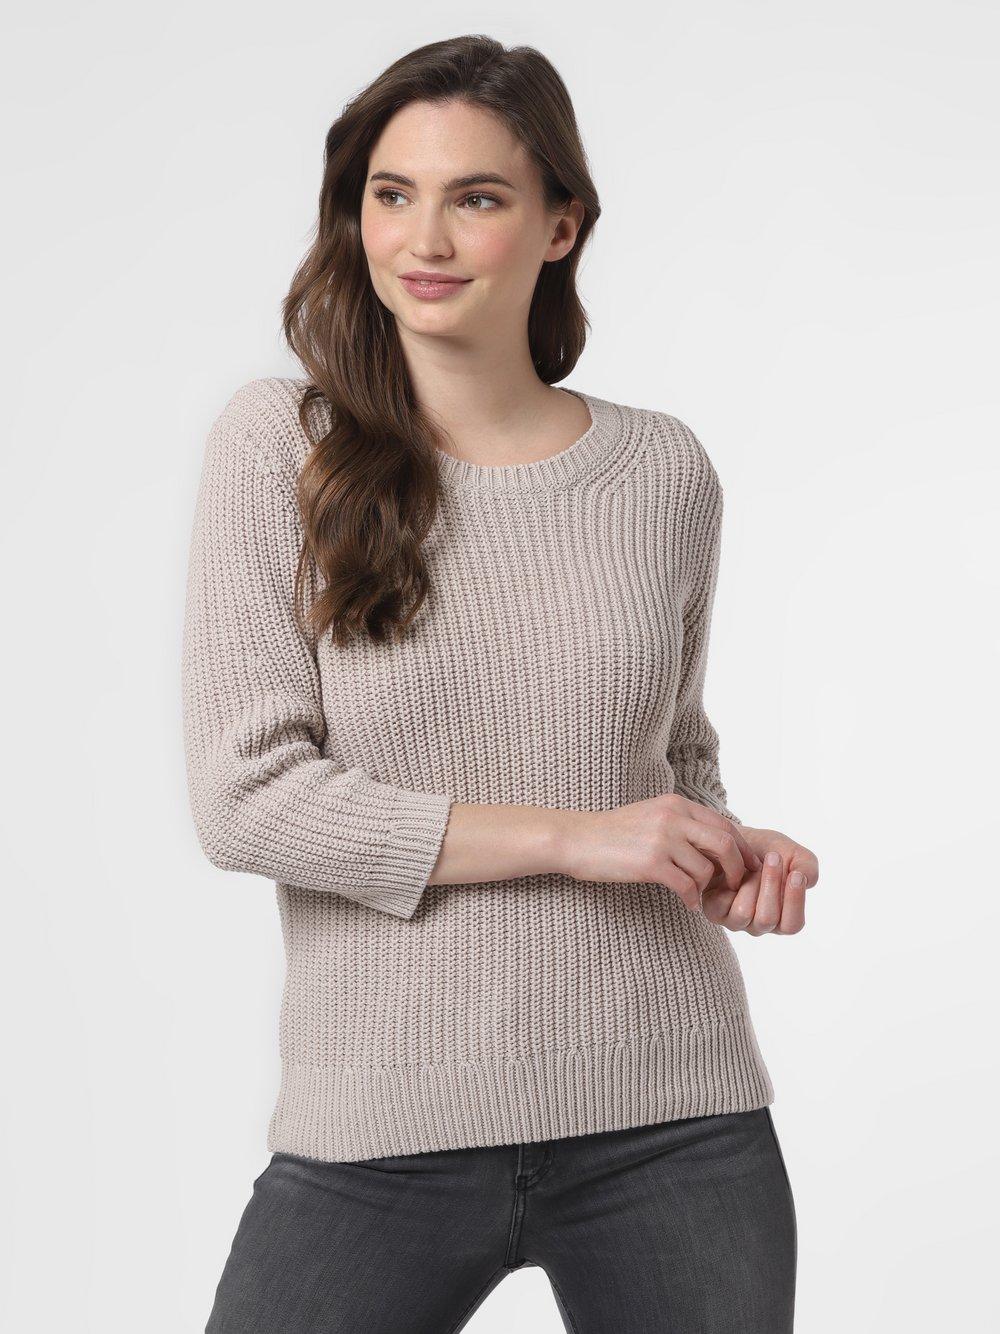 SvB Exquisit - Sweter damski, beżowy